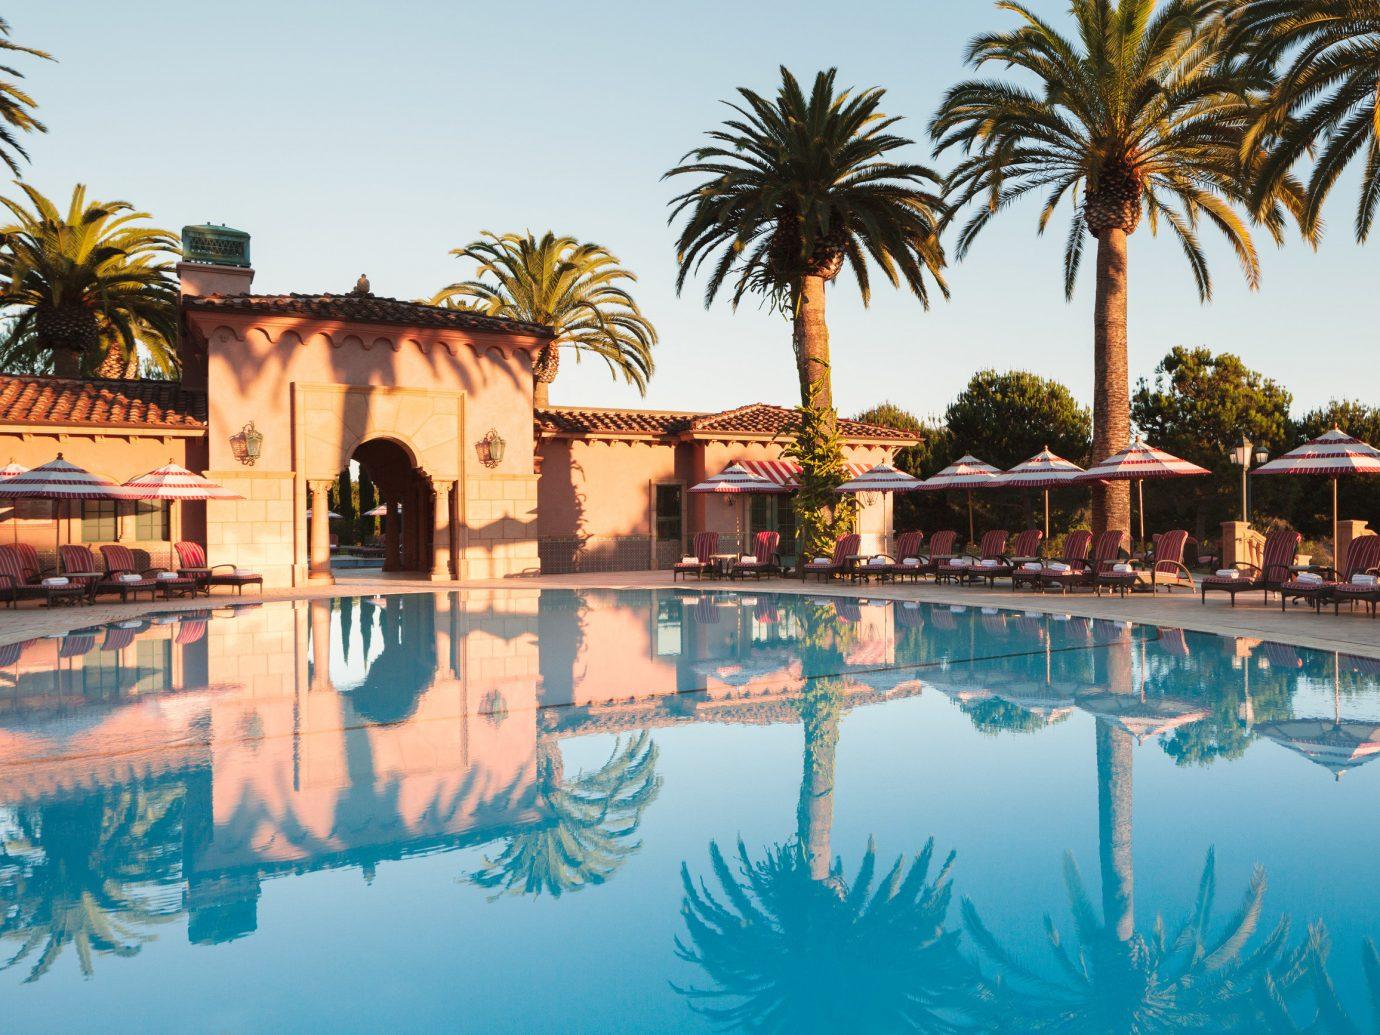 San Diego Resort - The Fairmont Grand Del Mar